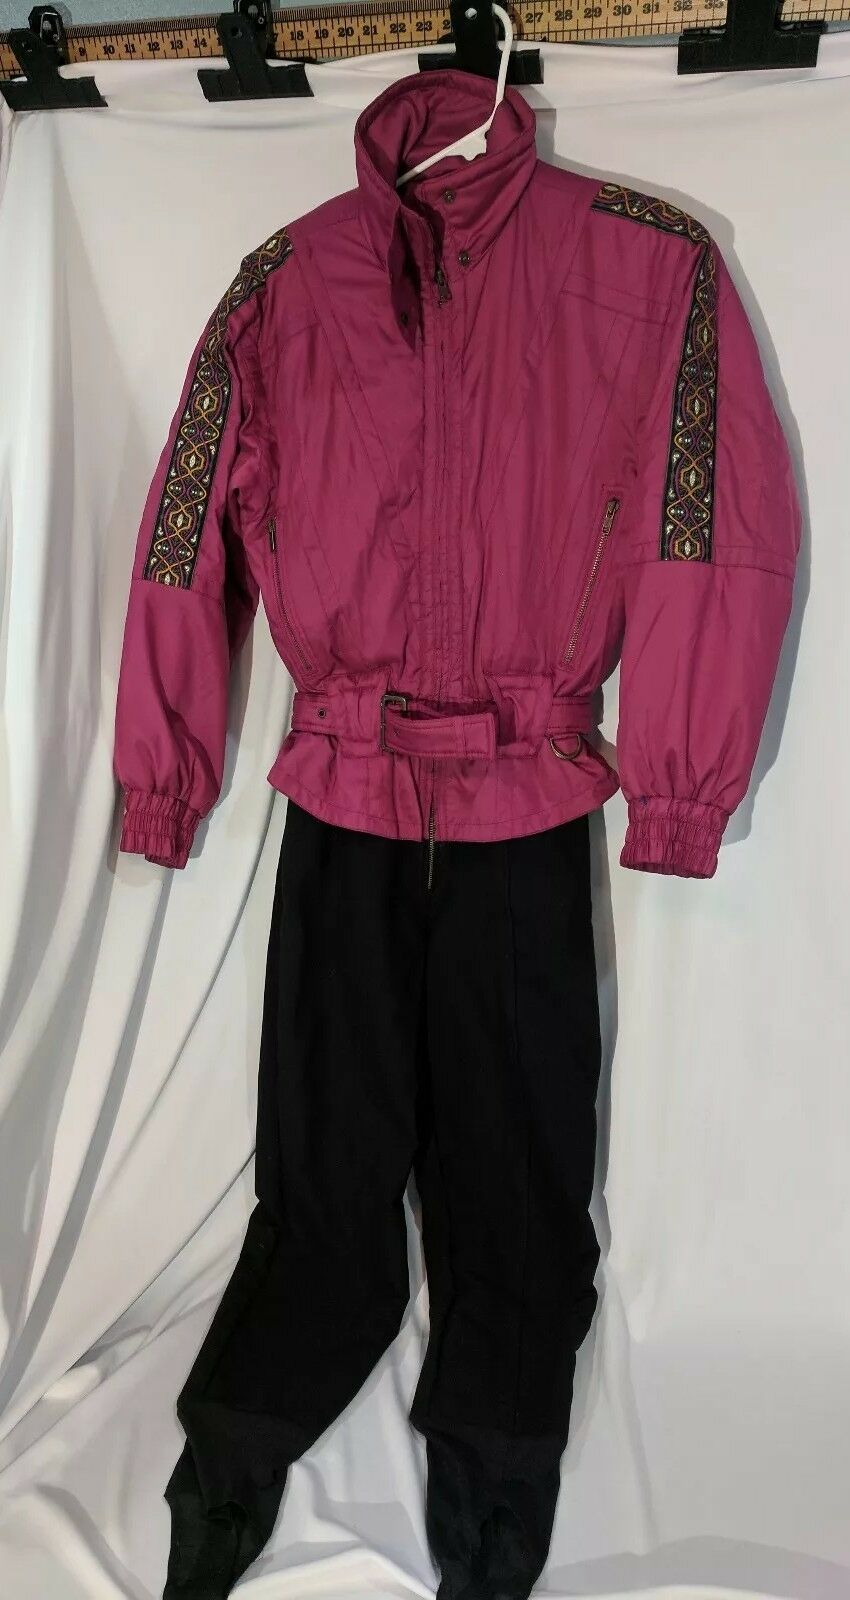 Women's Size 8 White Stag Brand Vintage 90's Snow Ski Suit Onsie stirrup pants